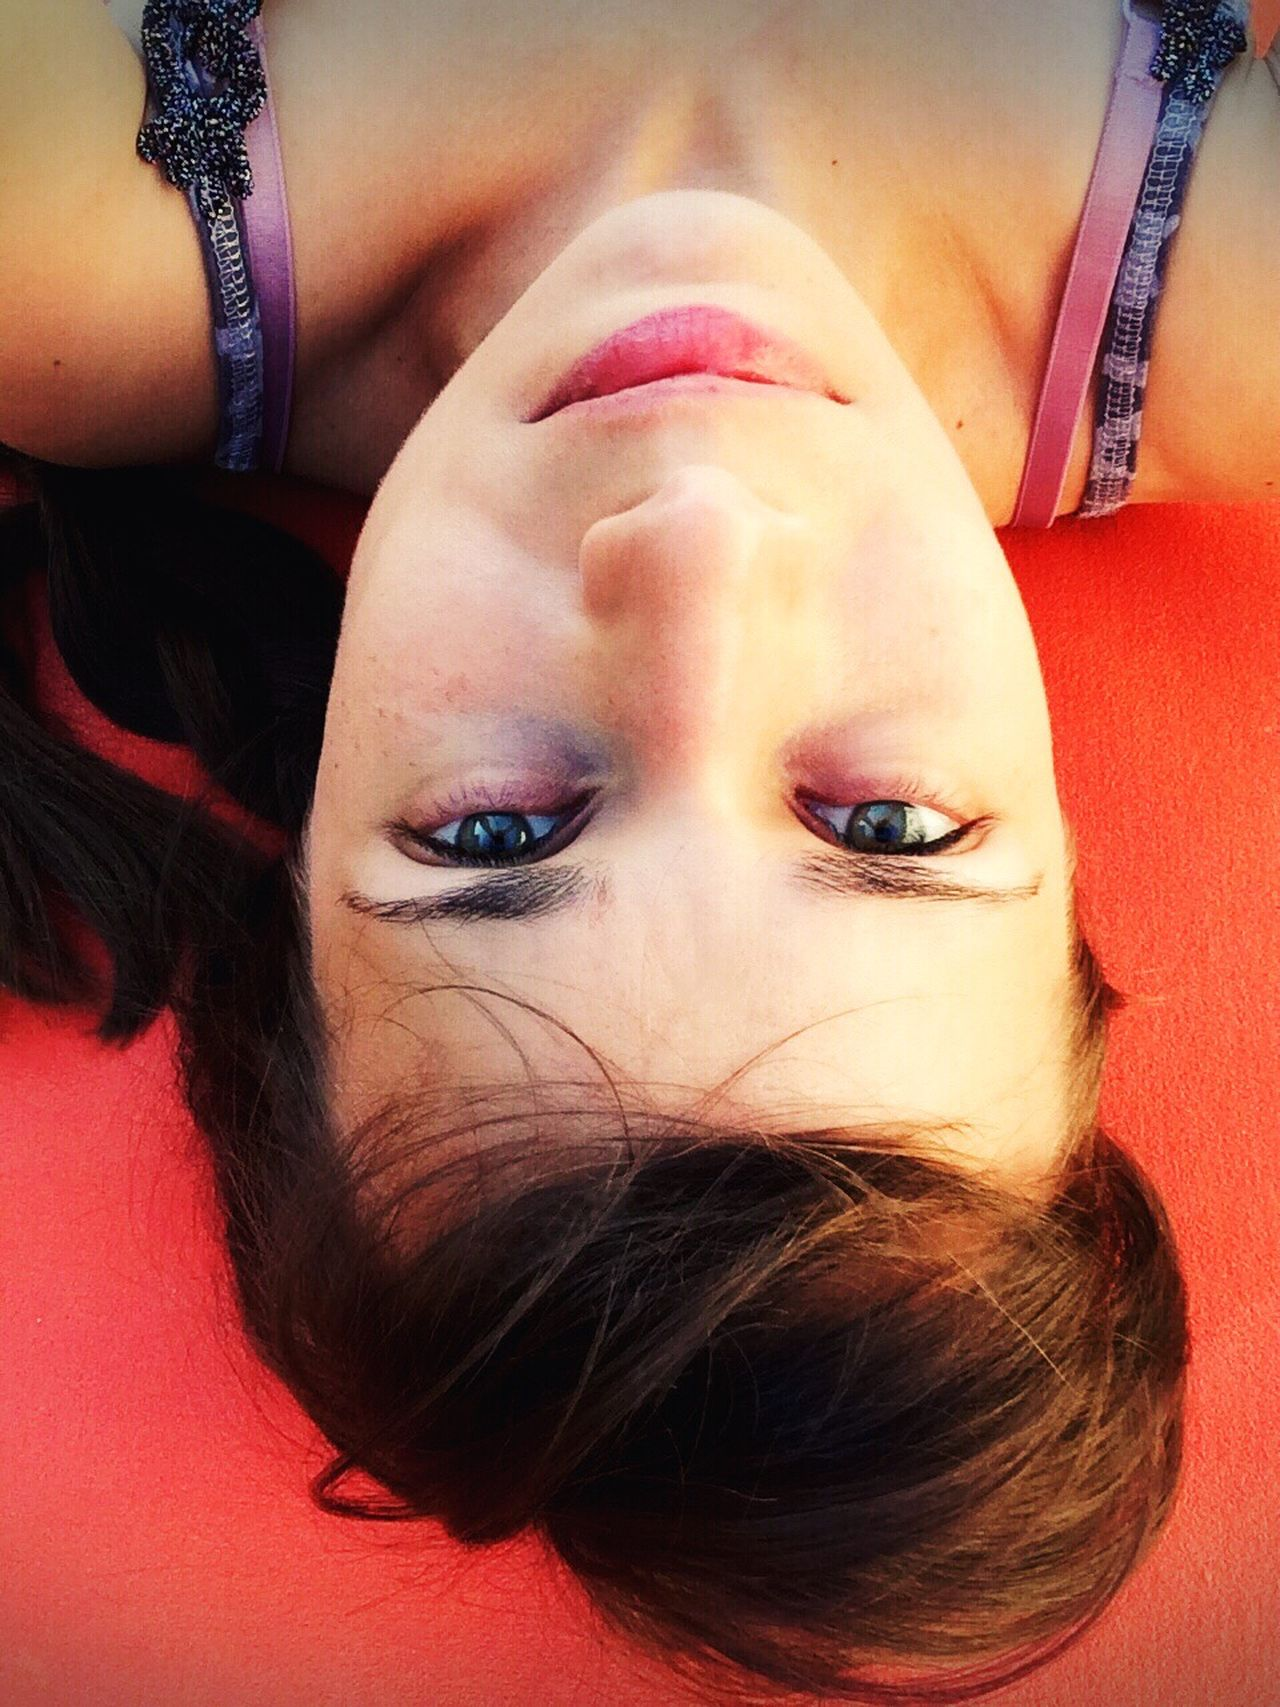 On yoga mat Yoga After Yoga Girl Looking At Camera Self Portrait Selfportrait Hello World Relaxing Enjoying Life Eyeem Selfie Eyeemphotography Woman Woman Portrait